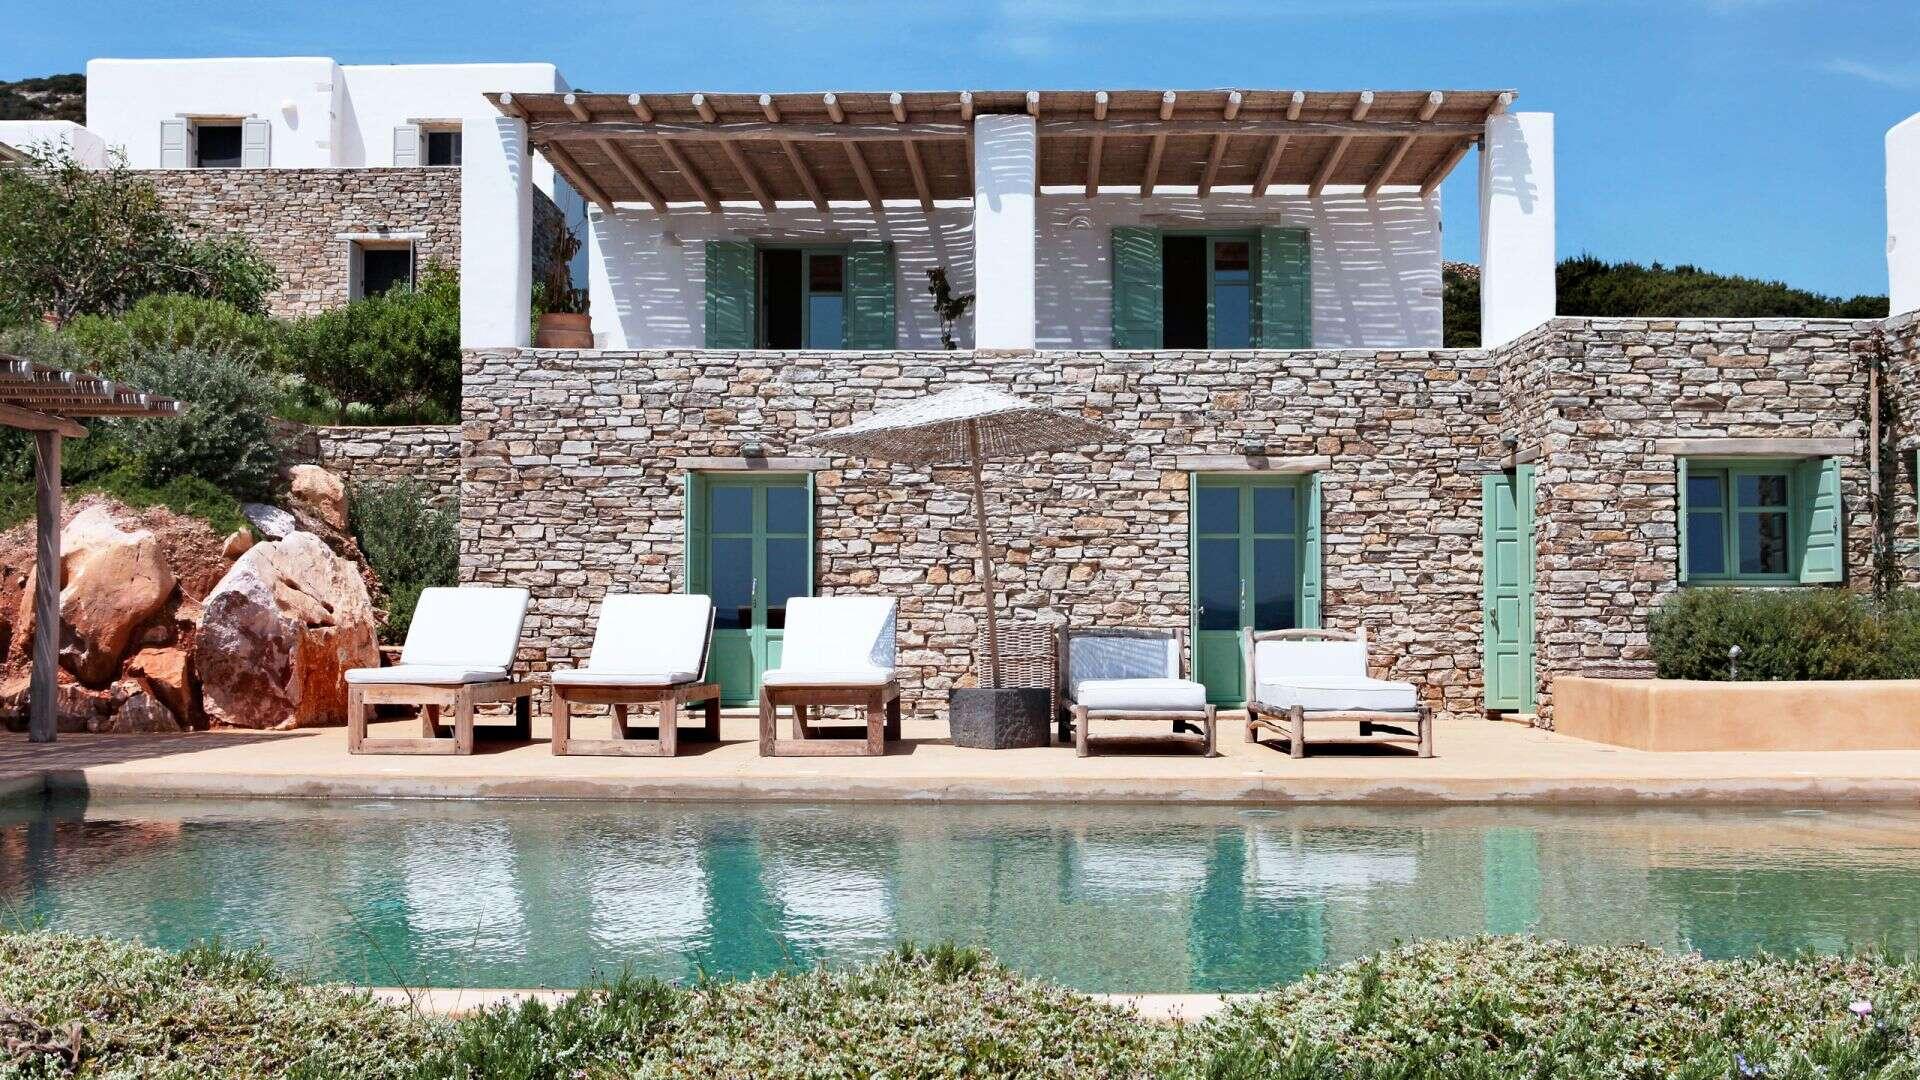 Luxury vacation rentals europe - Greece - Antiparos - Magganies - Dandelion - Image 1/9